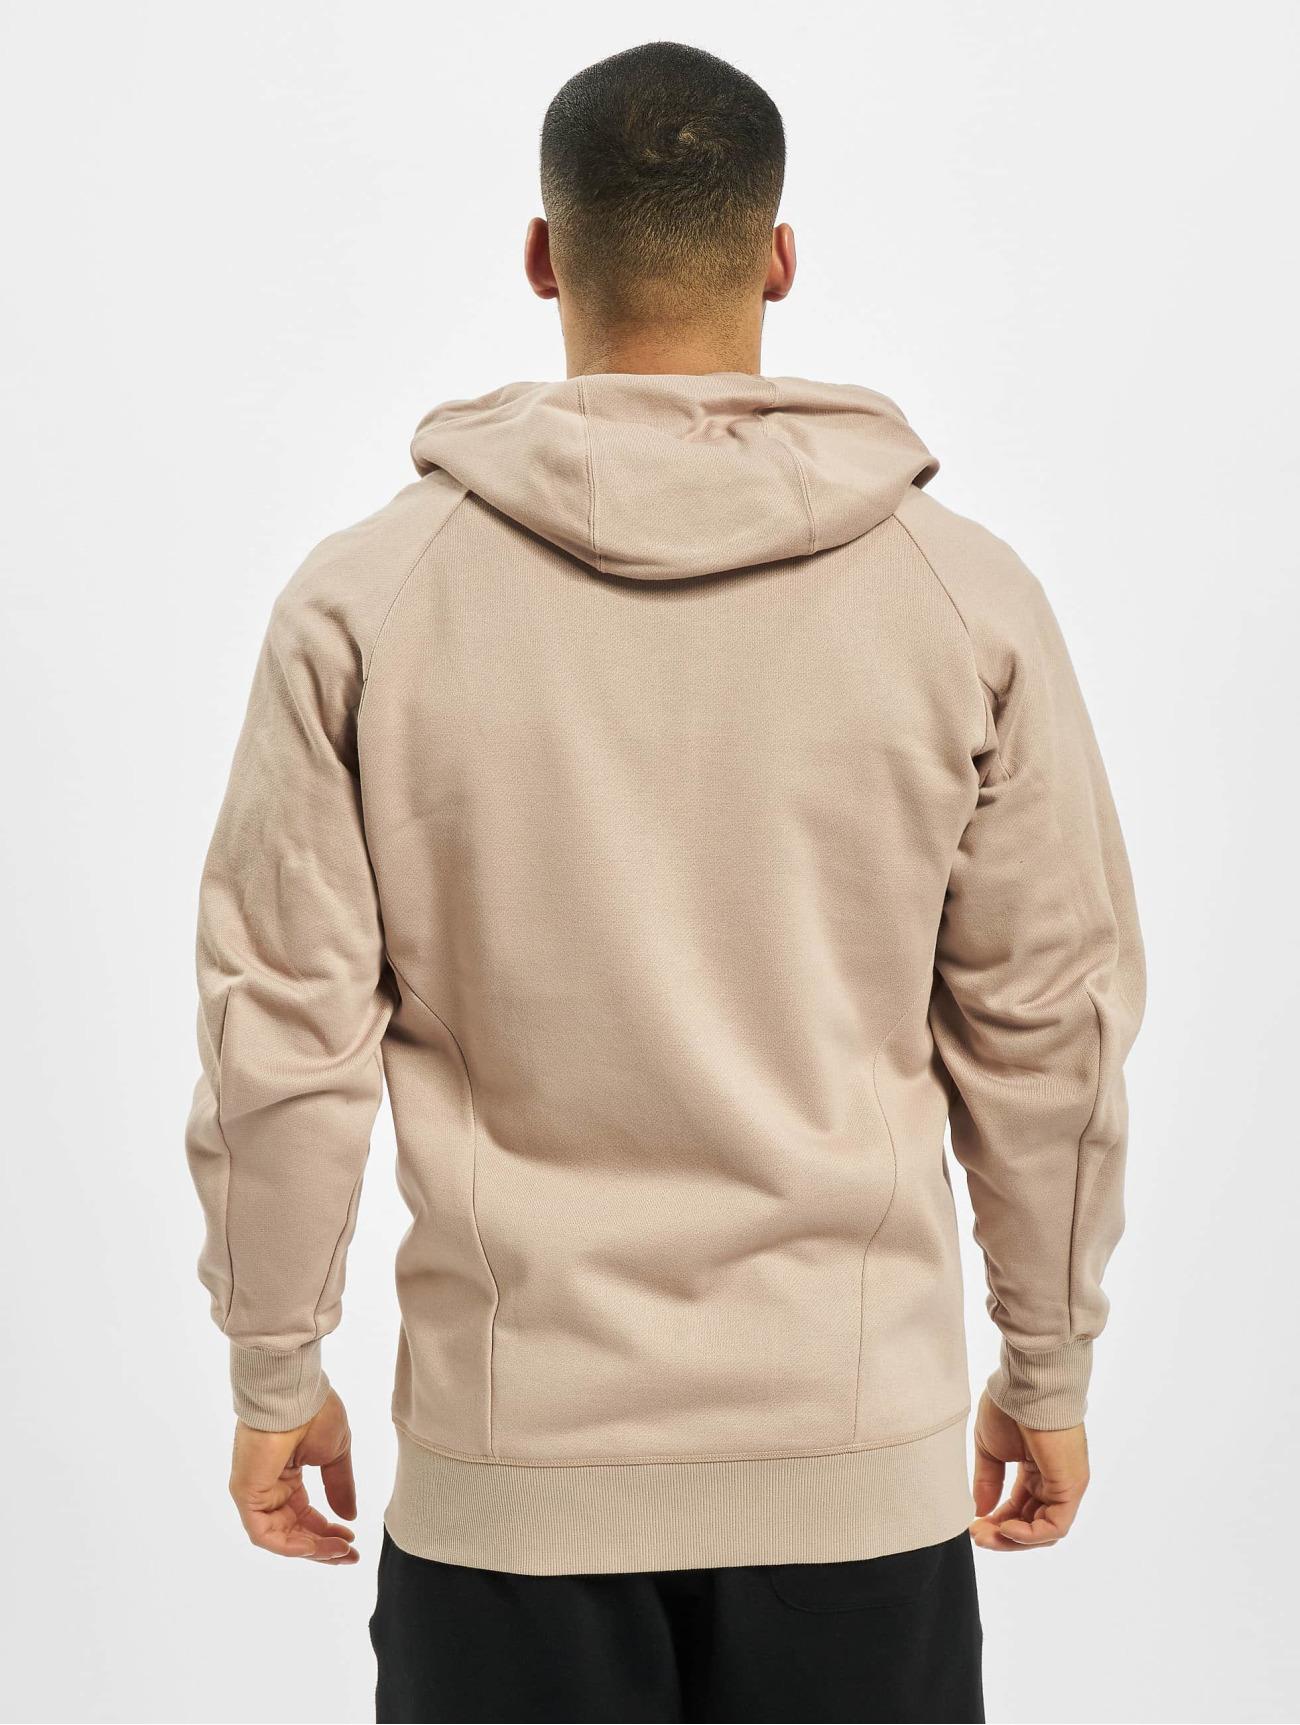 adidas Originals | XBYO   brun Homme Sweat capuche zippé  558044| Homme Hauts